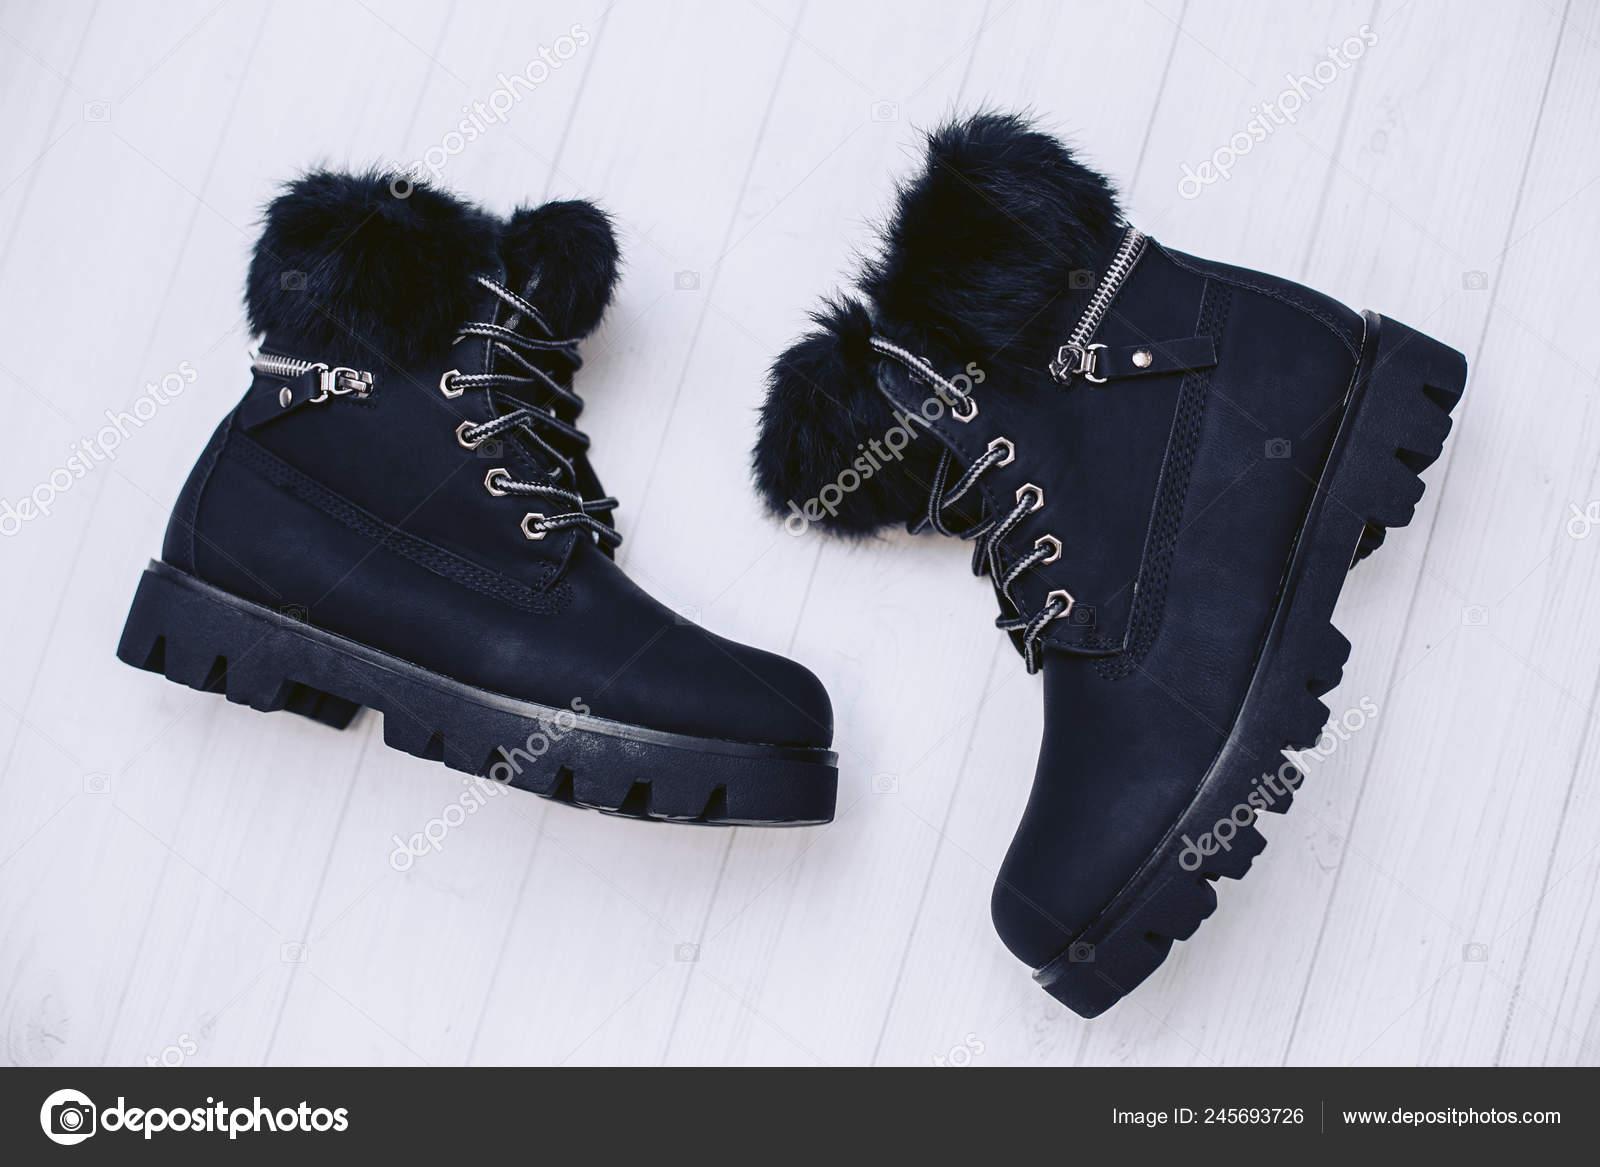 Pair Stylish Women Winter Boots Made